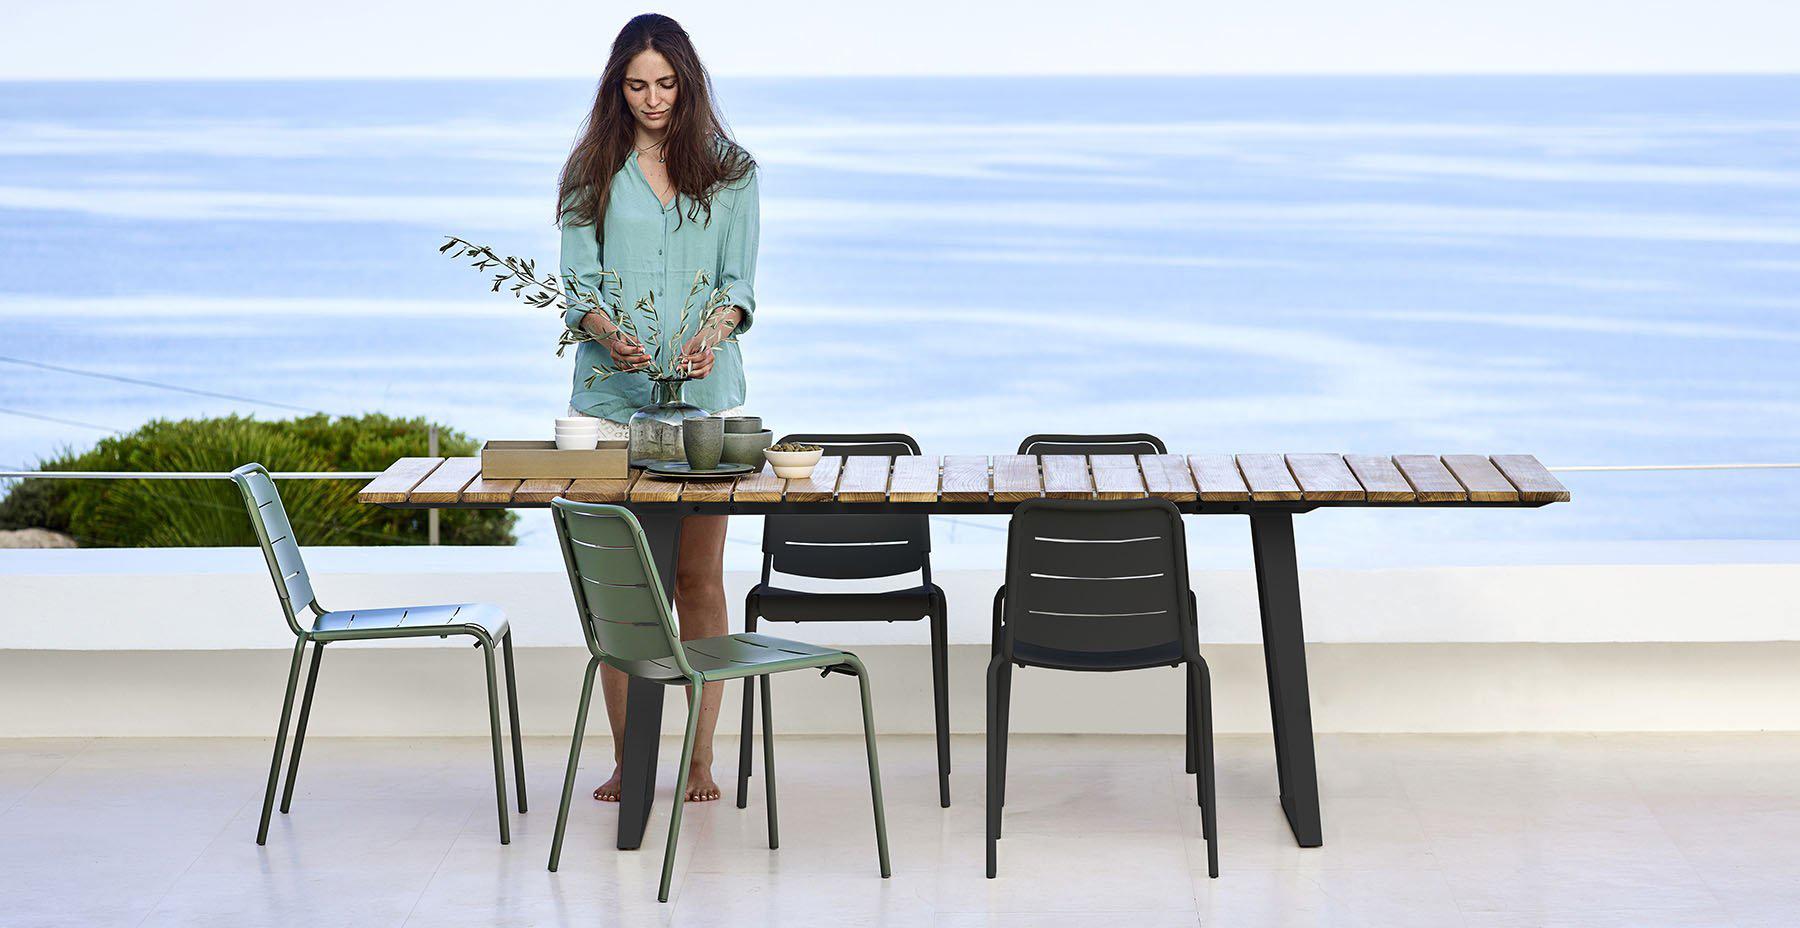 cane-line copenhagen dining table lifestyle